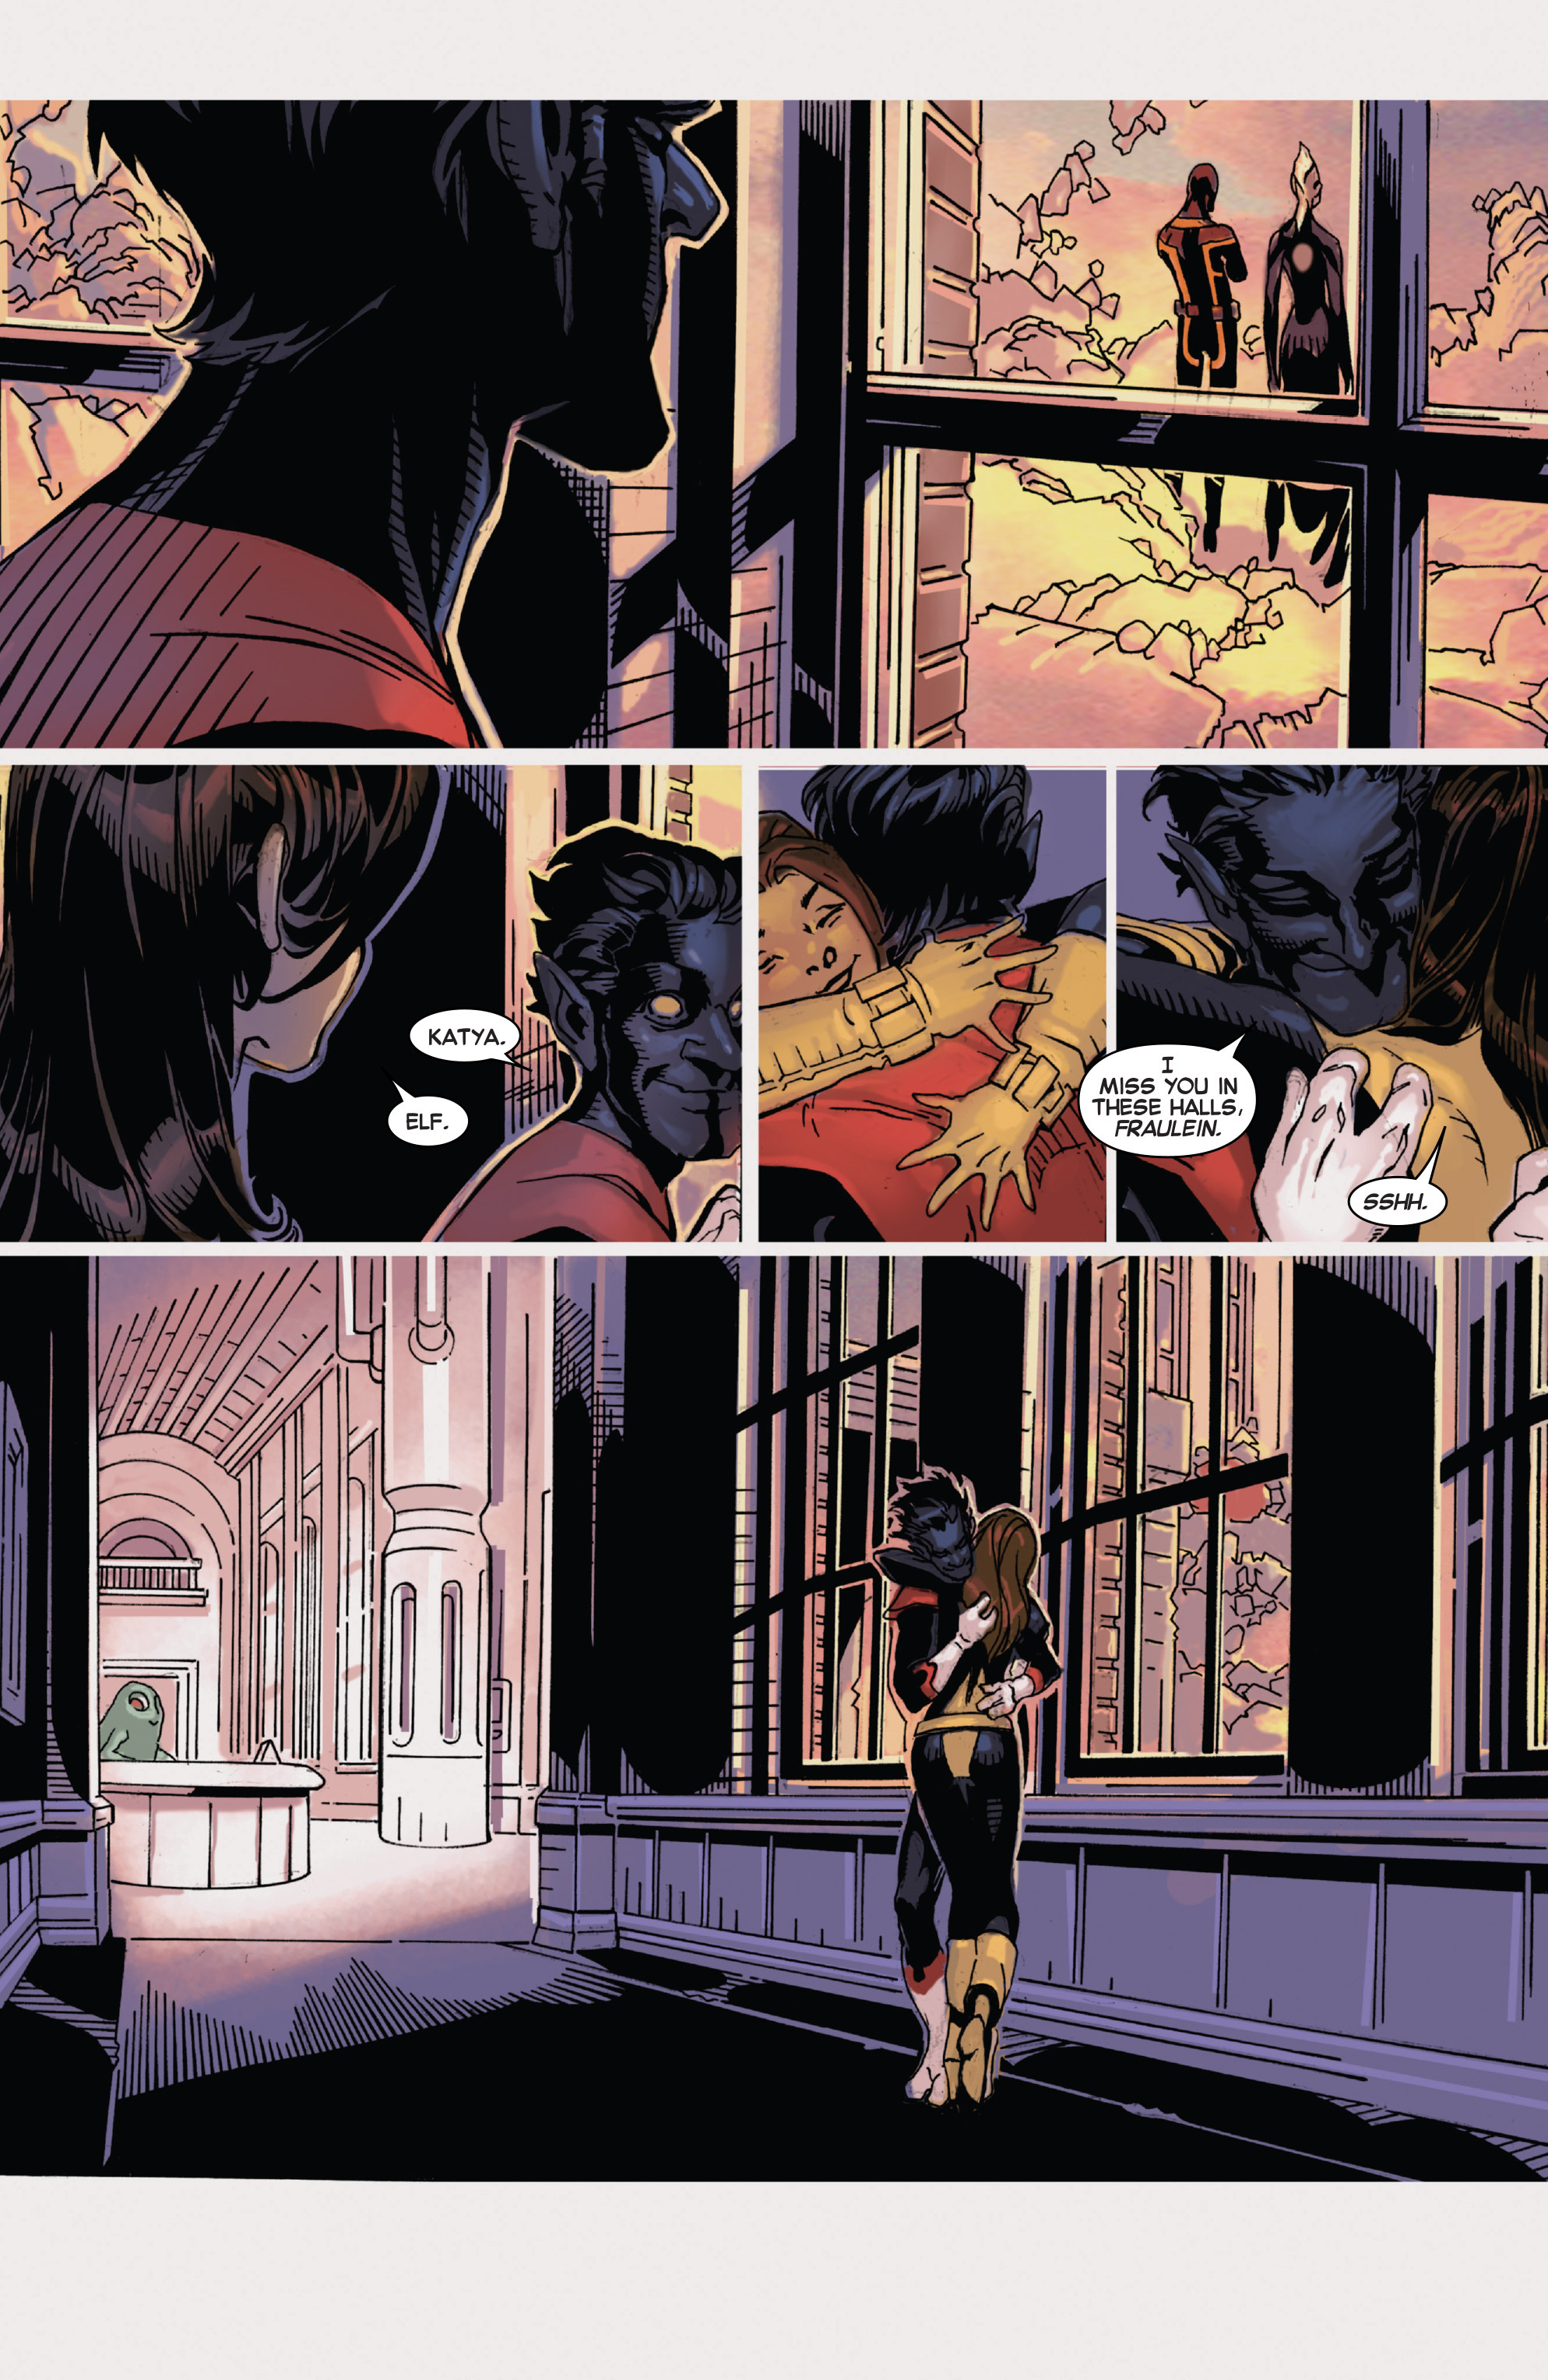 Read online Uncanny X-Men (2013) comic -  Issue # _TPB 4 - vs. S.H.I.E.L.D - 125